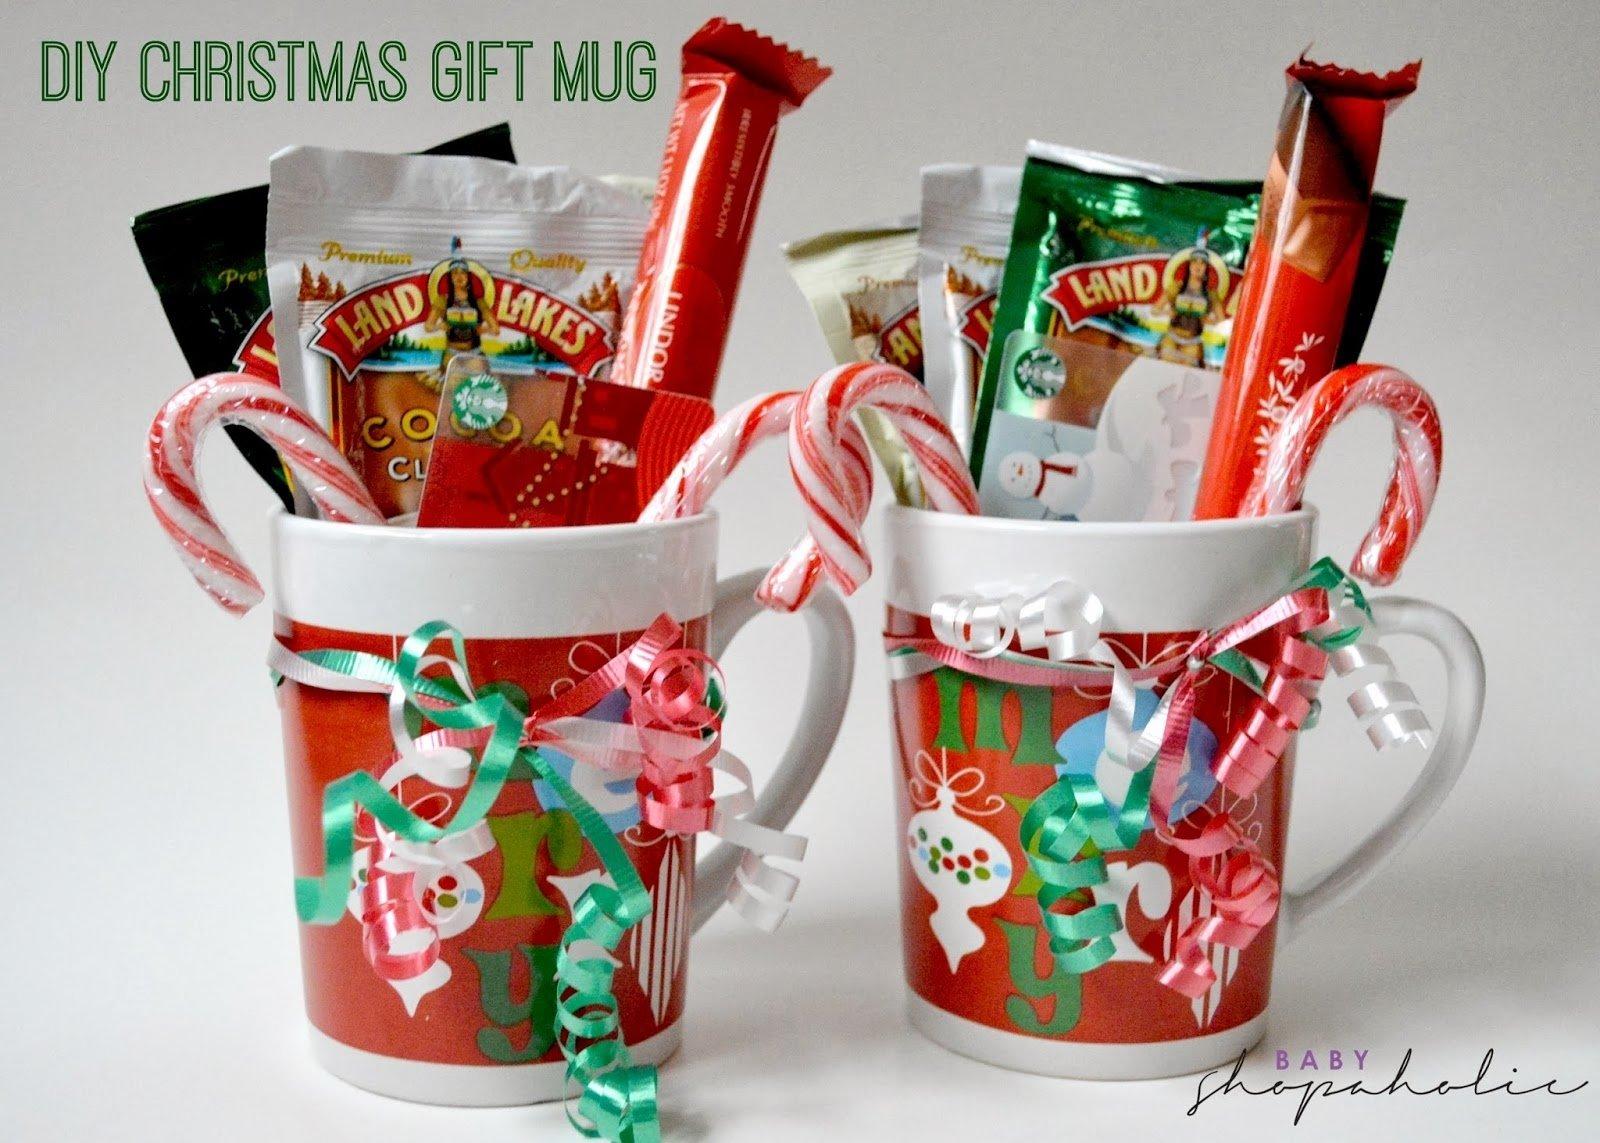 10 Ideal Cheap Ideas For Christmas Gifts cheap diy christmas gift ideas all saint day dma homes 42292 1 2020